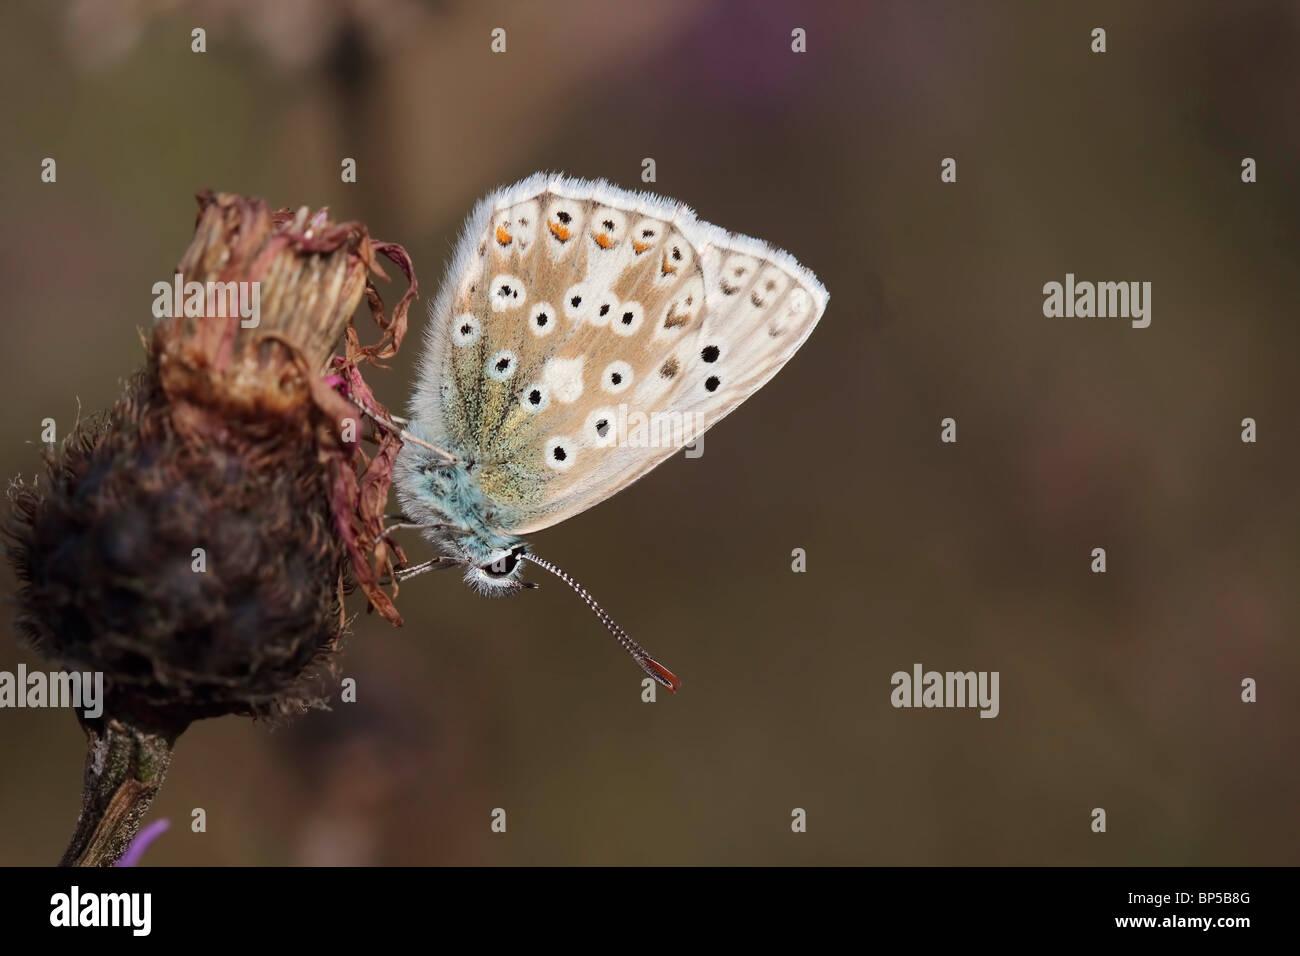 Chalkhill Blue Butterfly - Lysandra coridon.  Taken at Broadcroft Quarry, Portland, Dorset - Stock Image